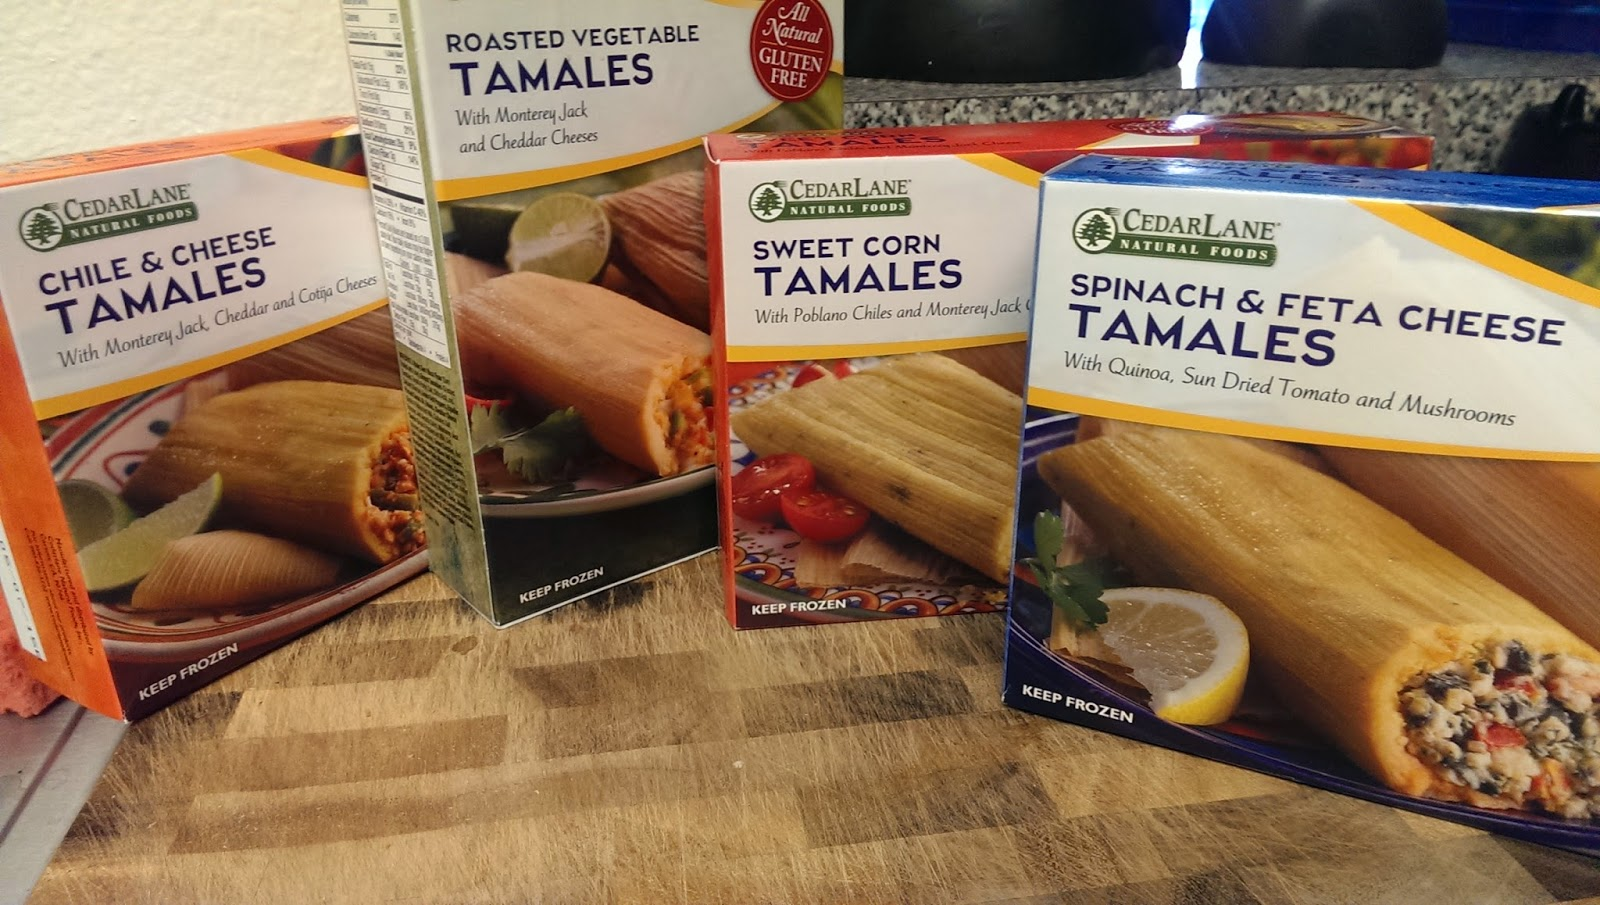 tamales Cedar Lane's New Gluten Free, Vegetarian Tamales - Cedar Lane Frozen Foods